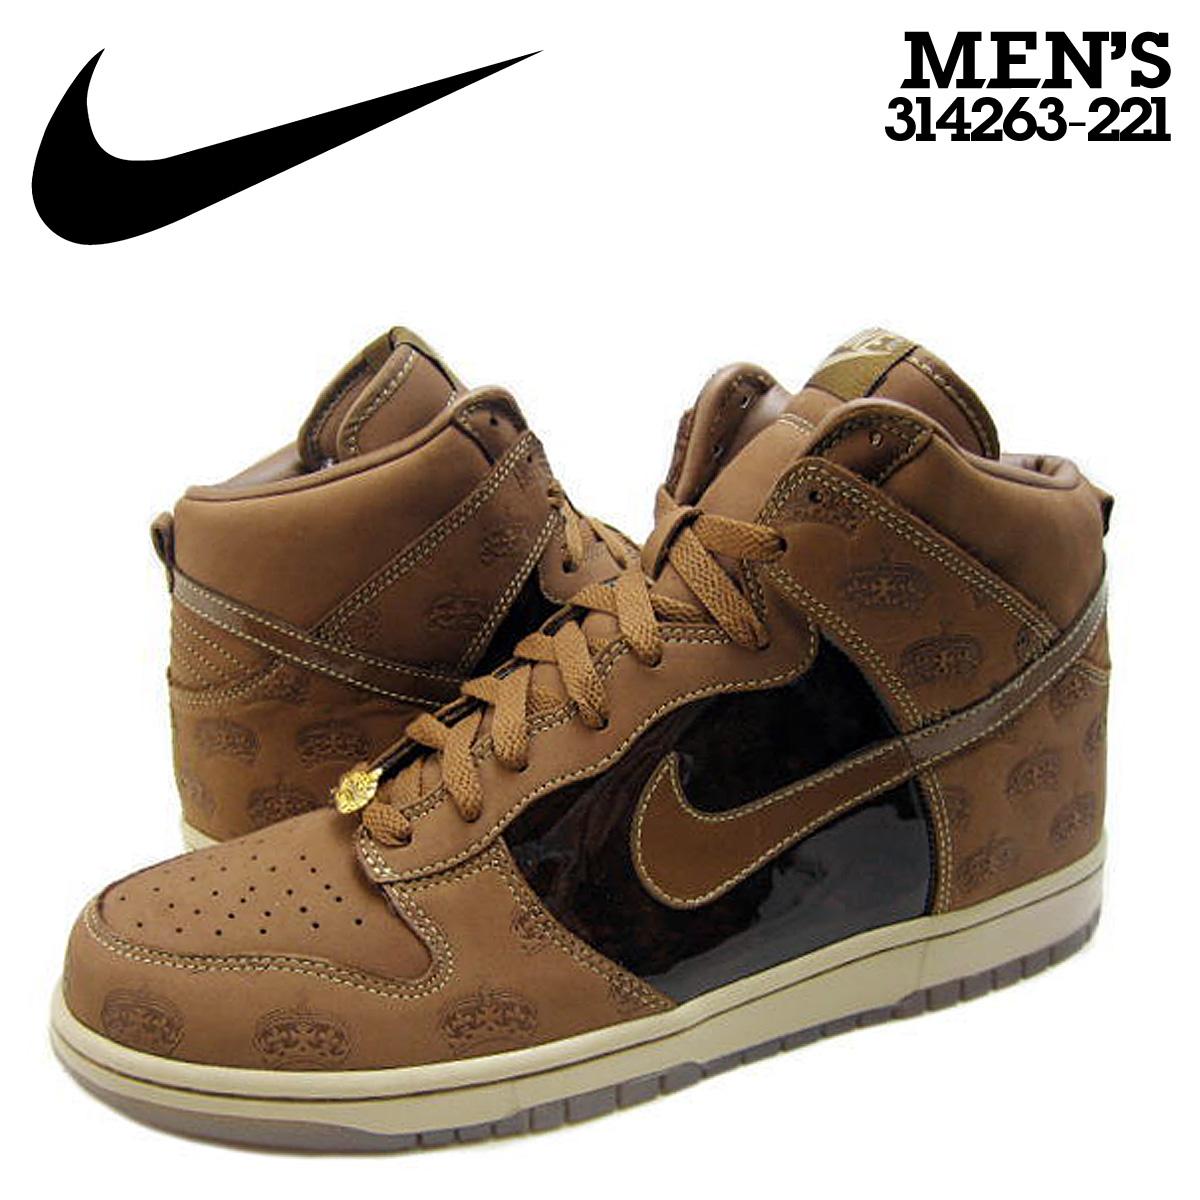 info for a2f9a da08b store shop this article nike nike dunk sneakers dunk high premium mighty  crown dunk hi premium